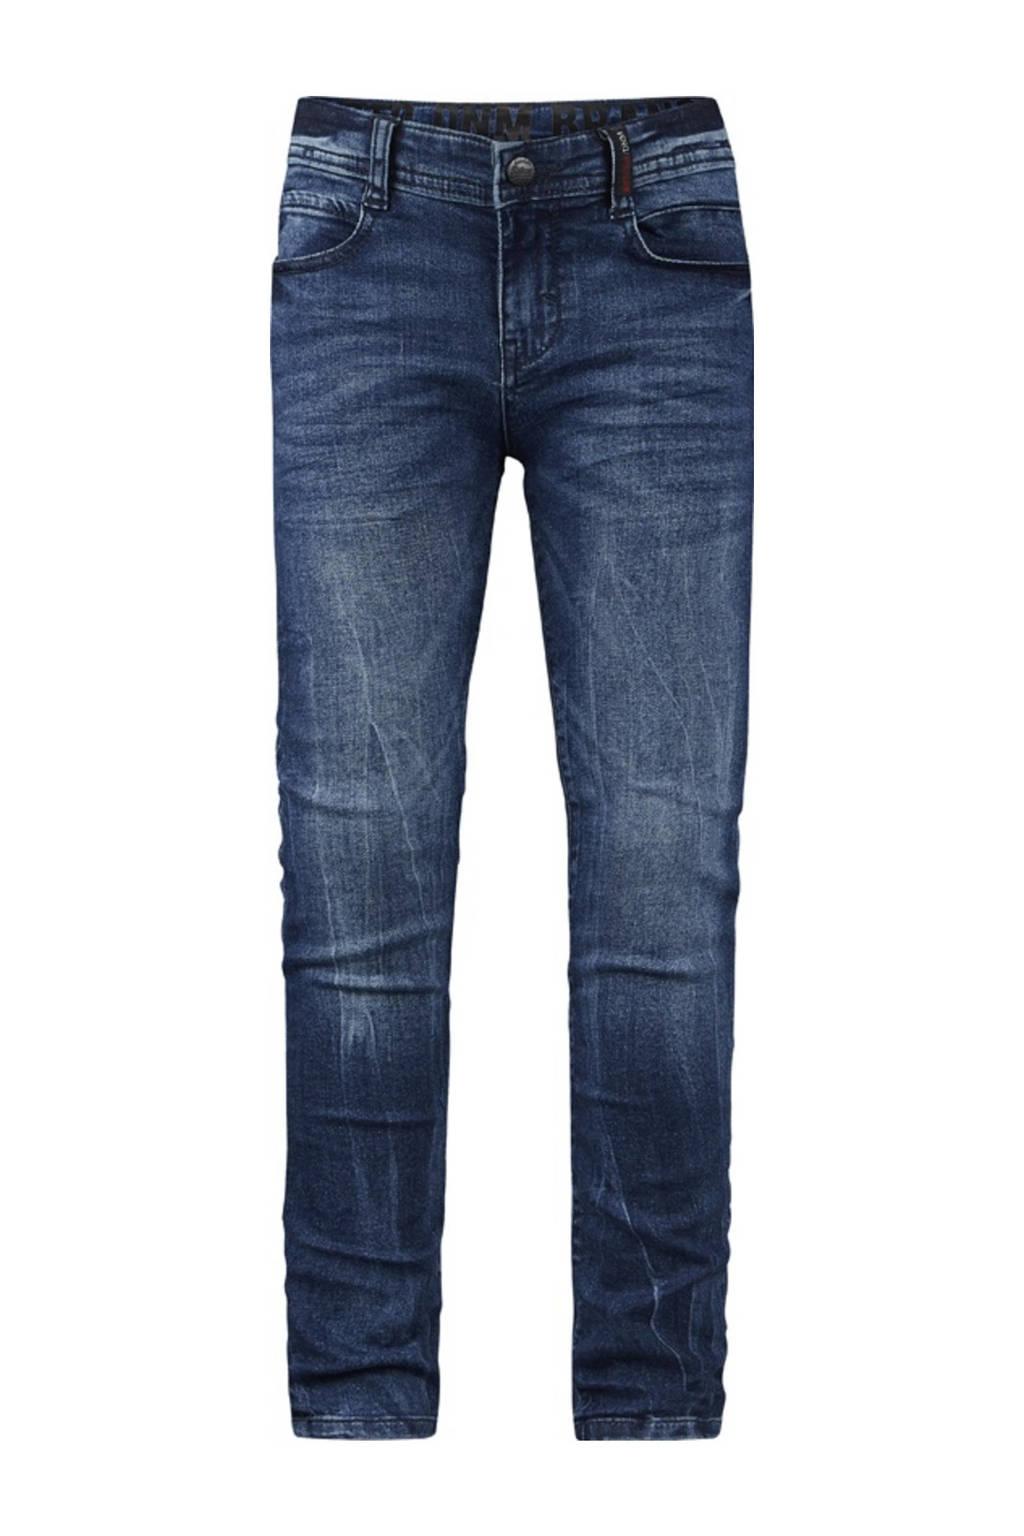 Retour Denim skinny fit jeans Tobias medium blue denim, Medium blue denim